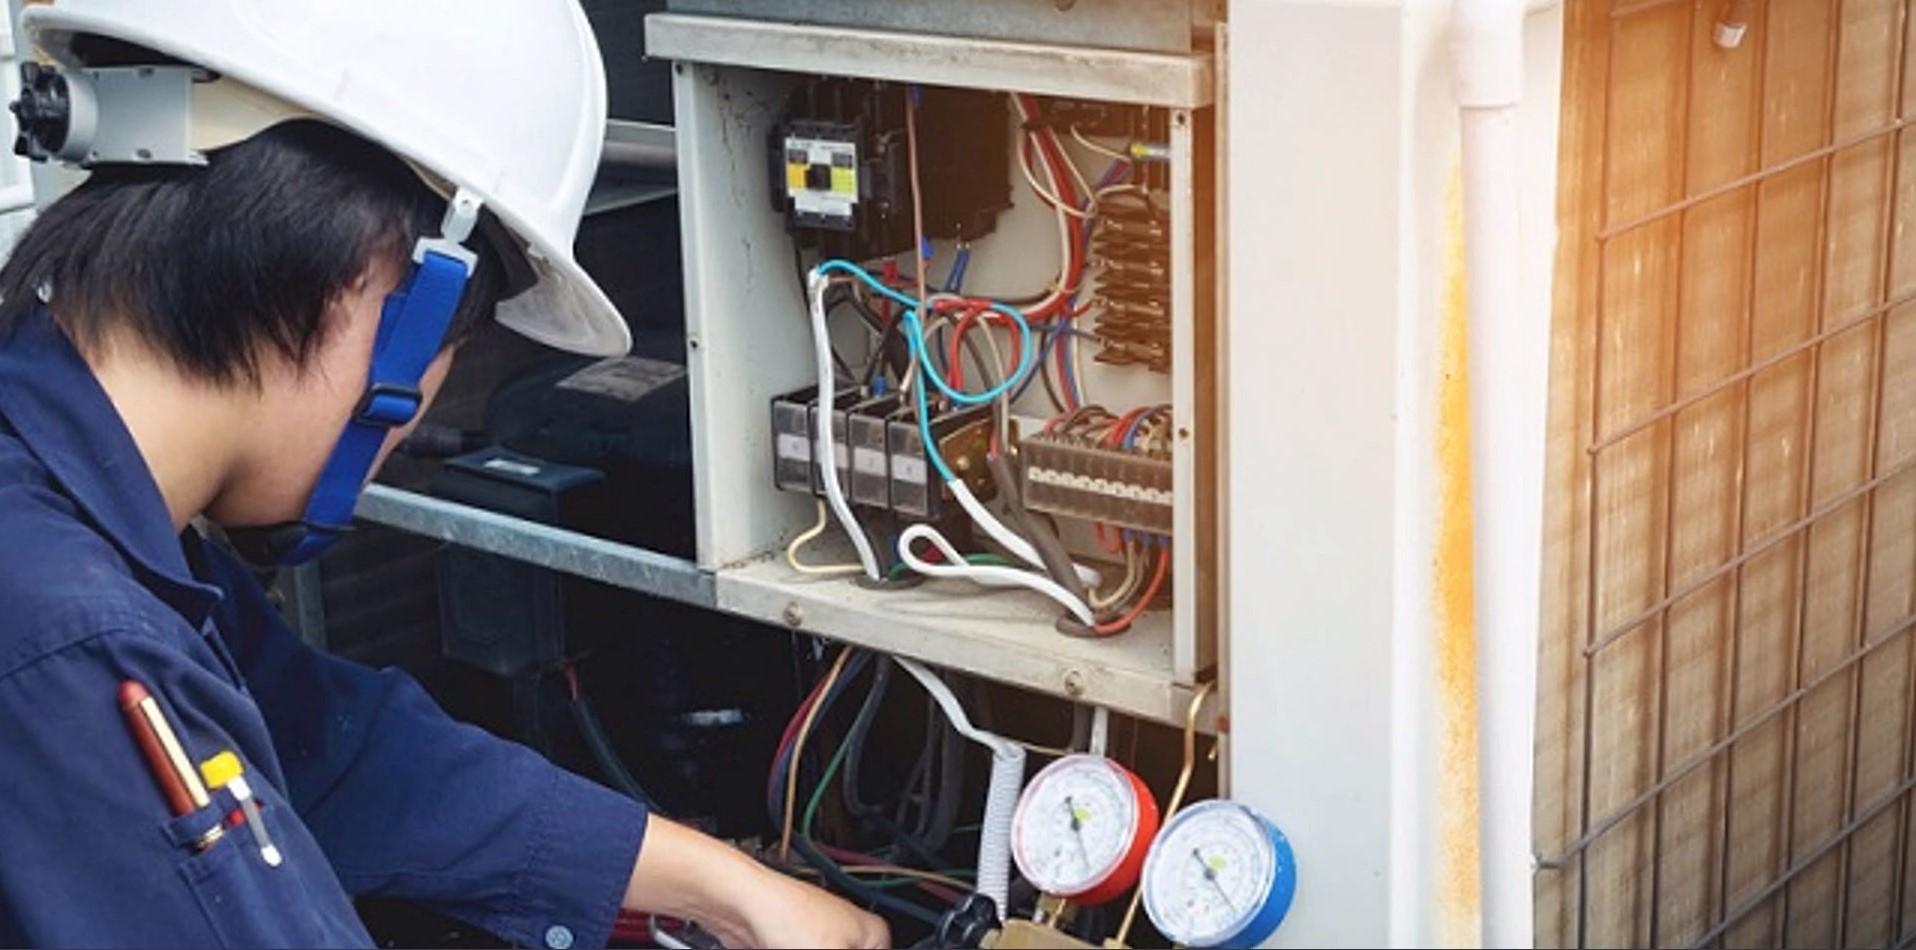 Commercial Heating Repair in Akron, Ohio